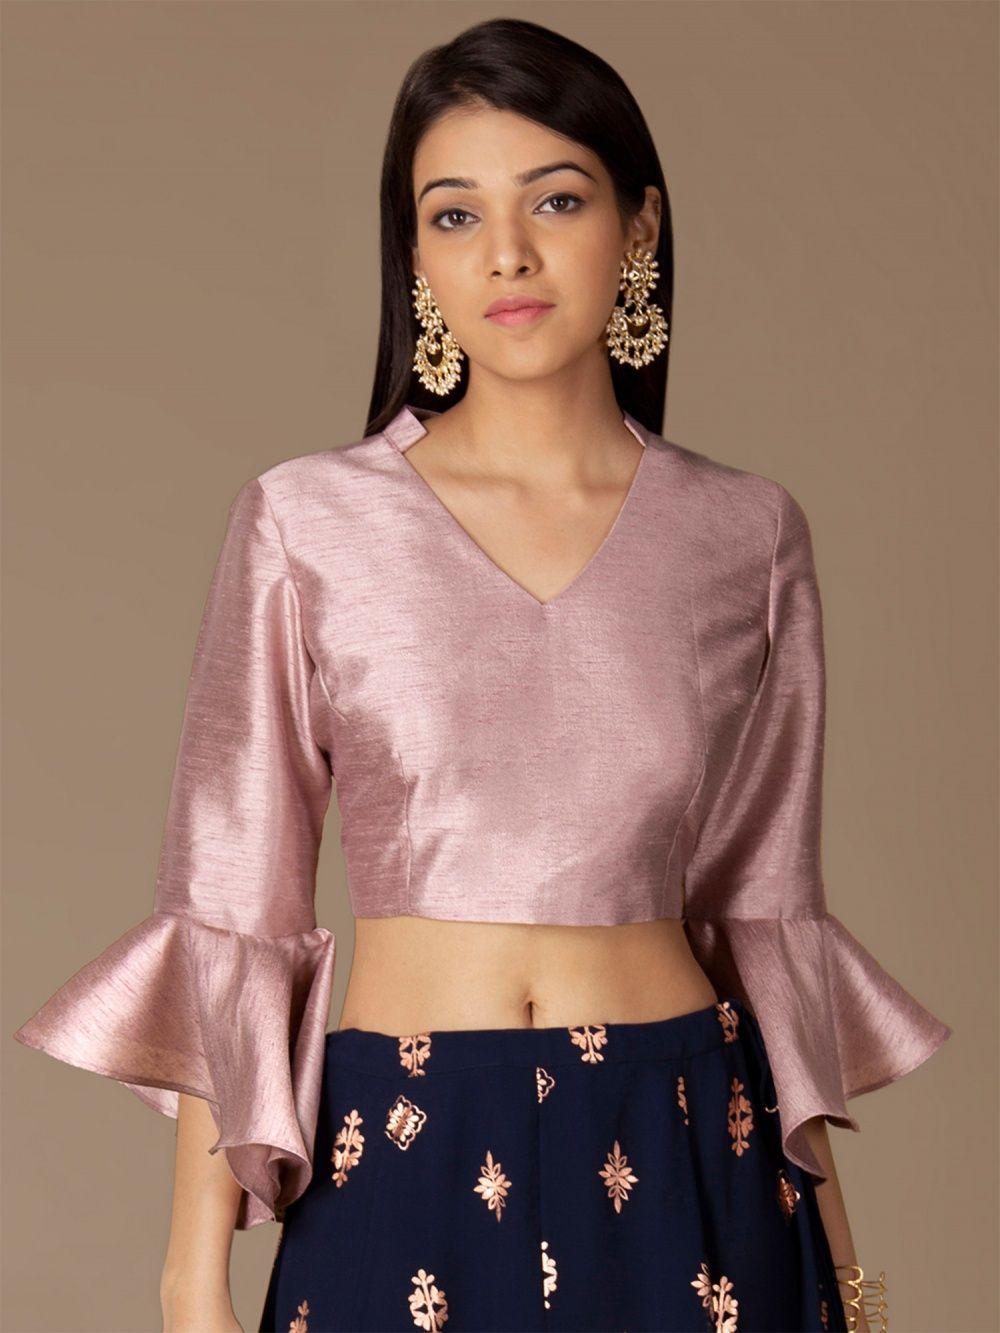 2dba1a35c3 Crop Top N Skirt Online